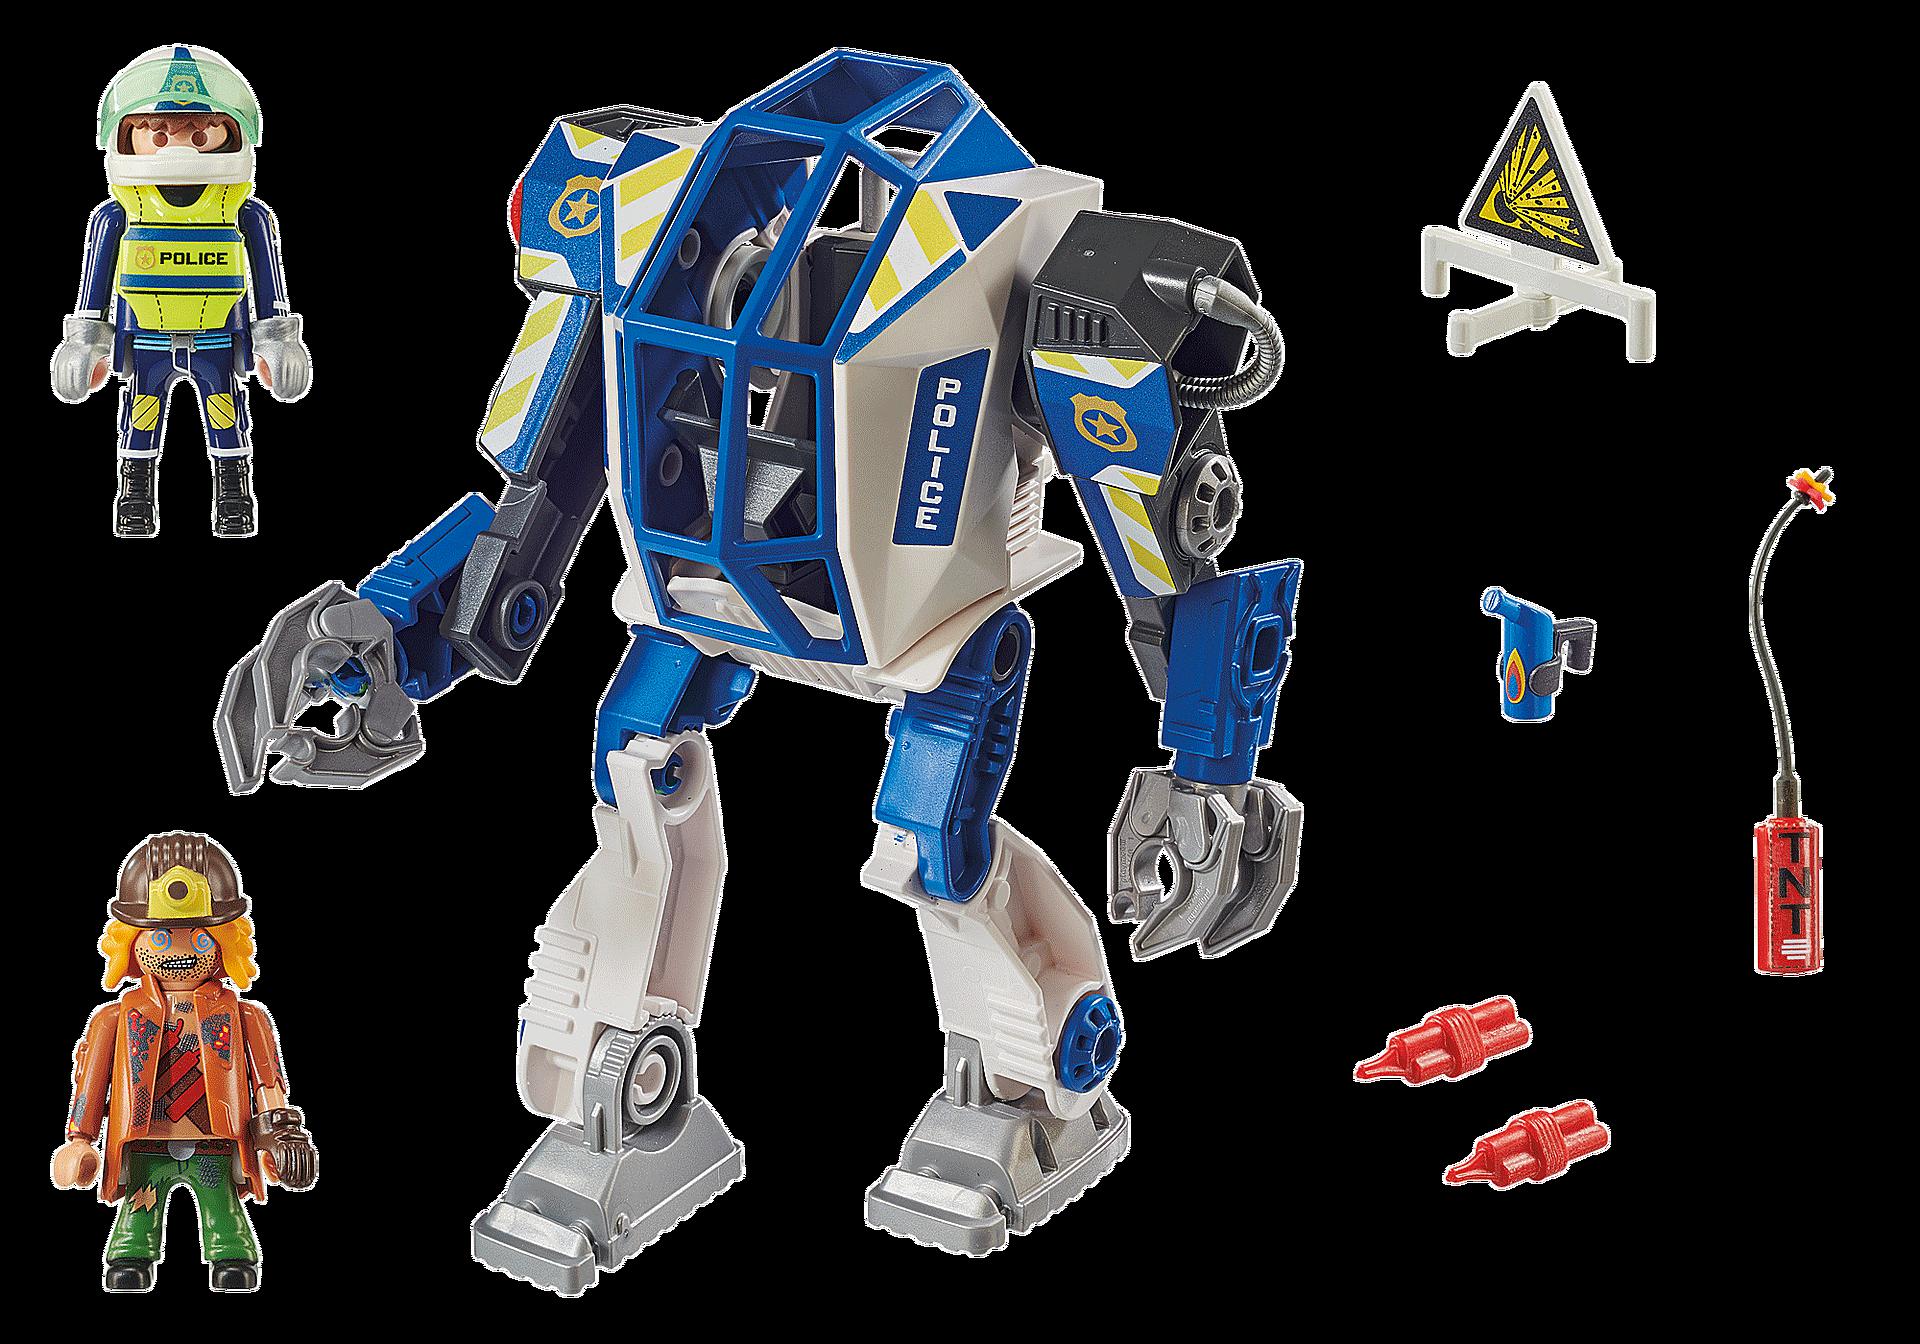 70571 Robot de police  zoom image3